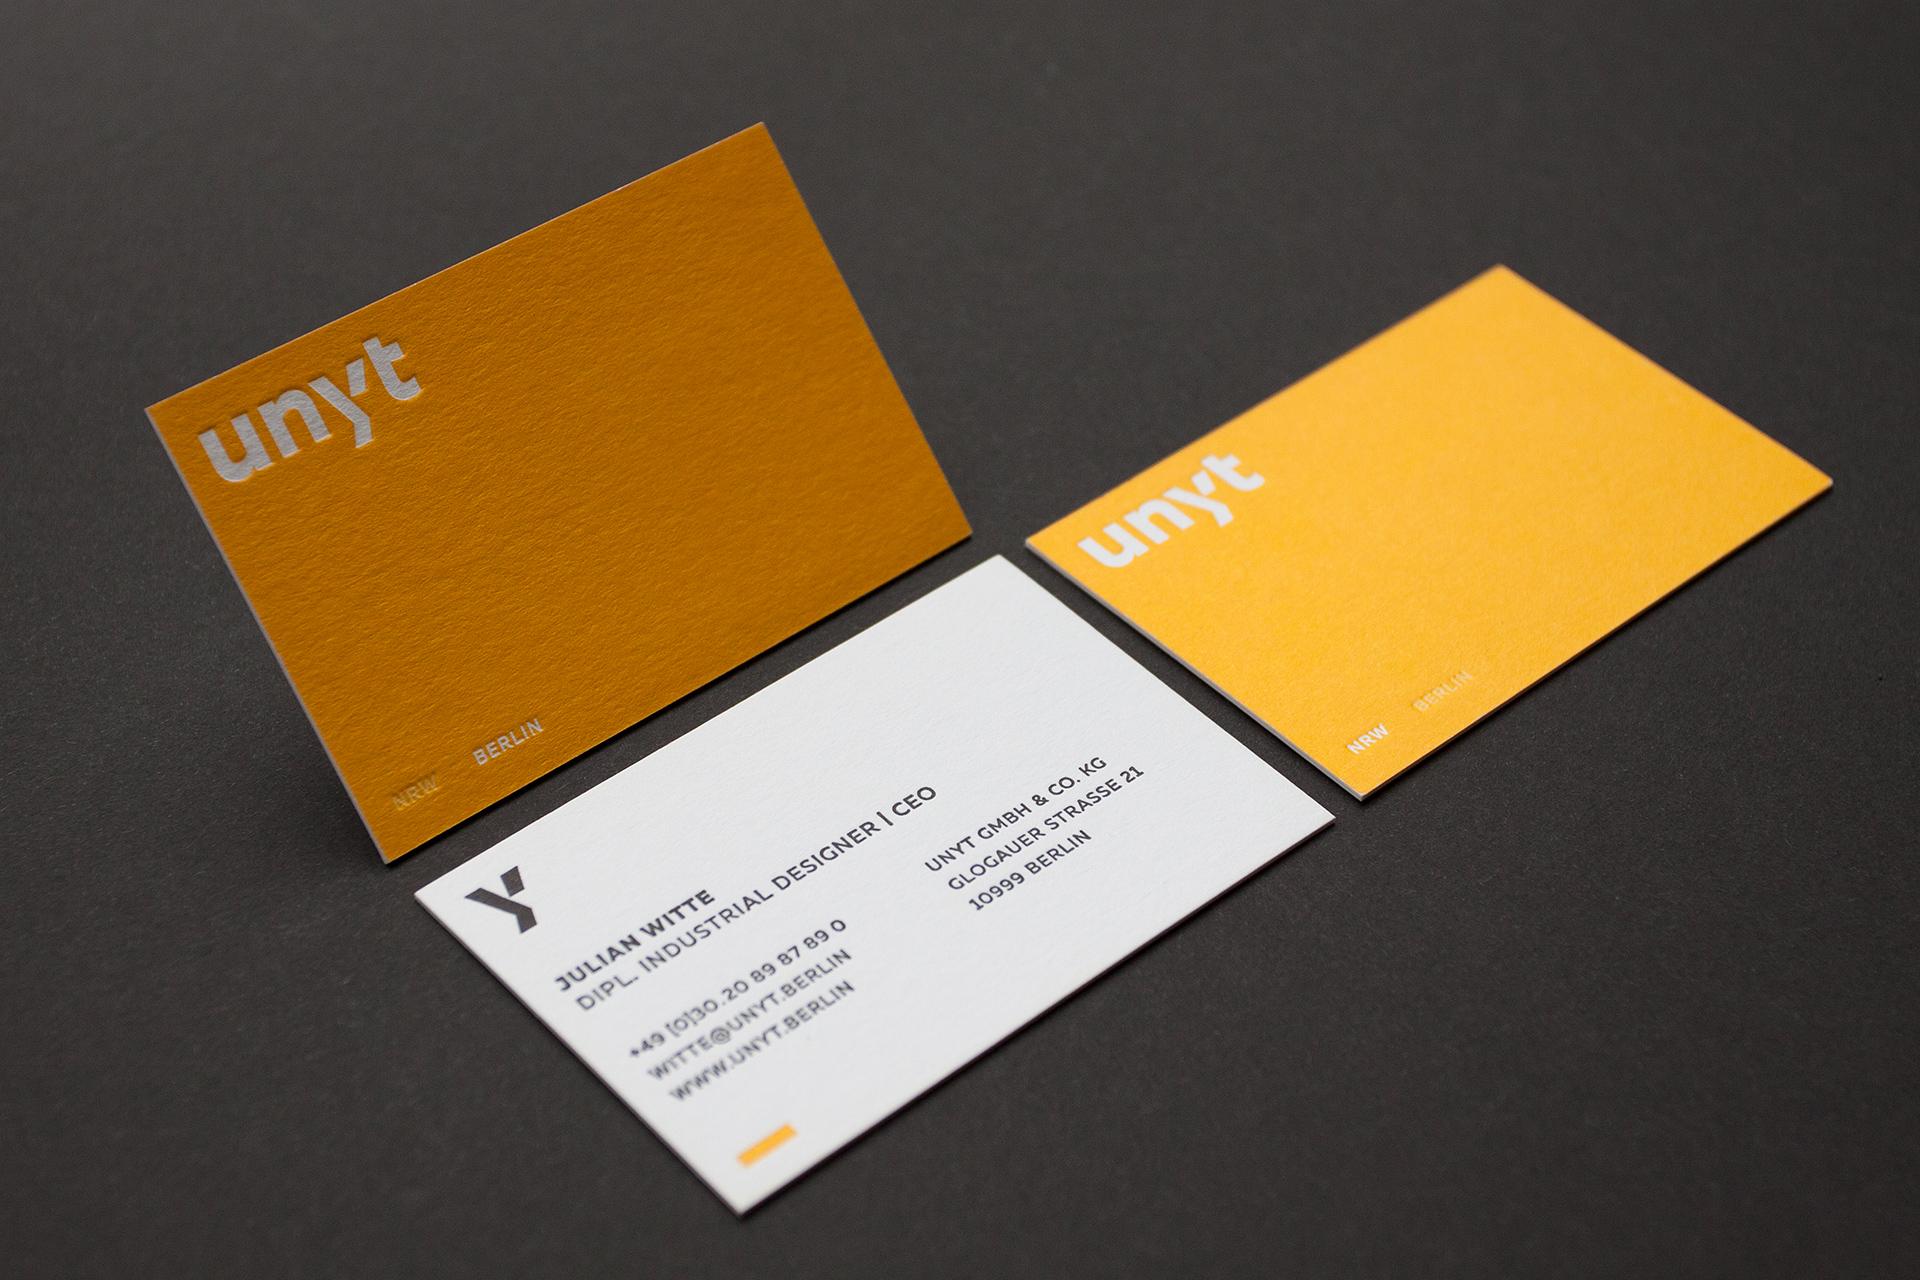 unyt-businesscard-2805